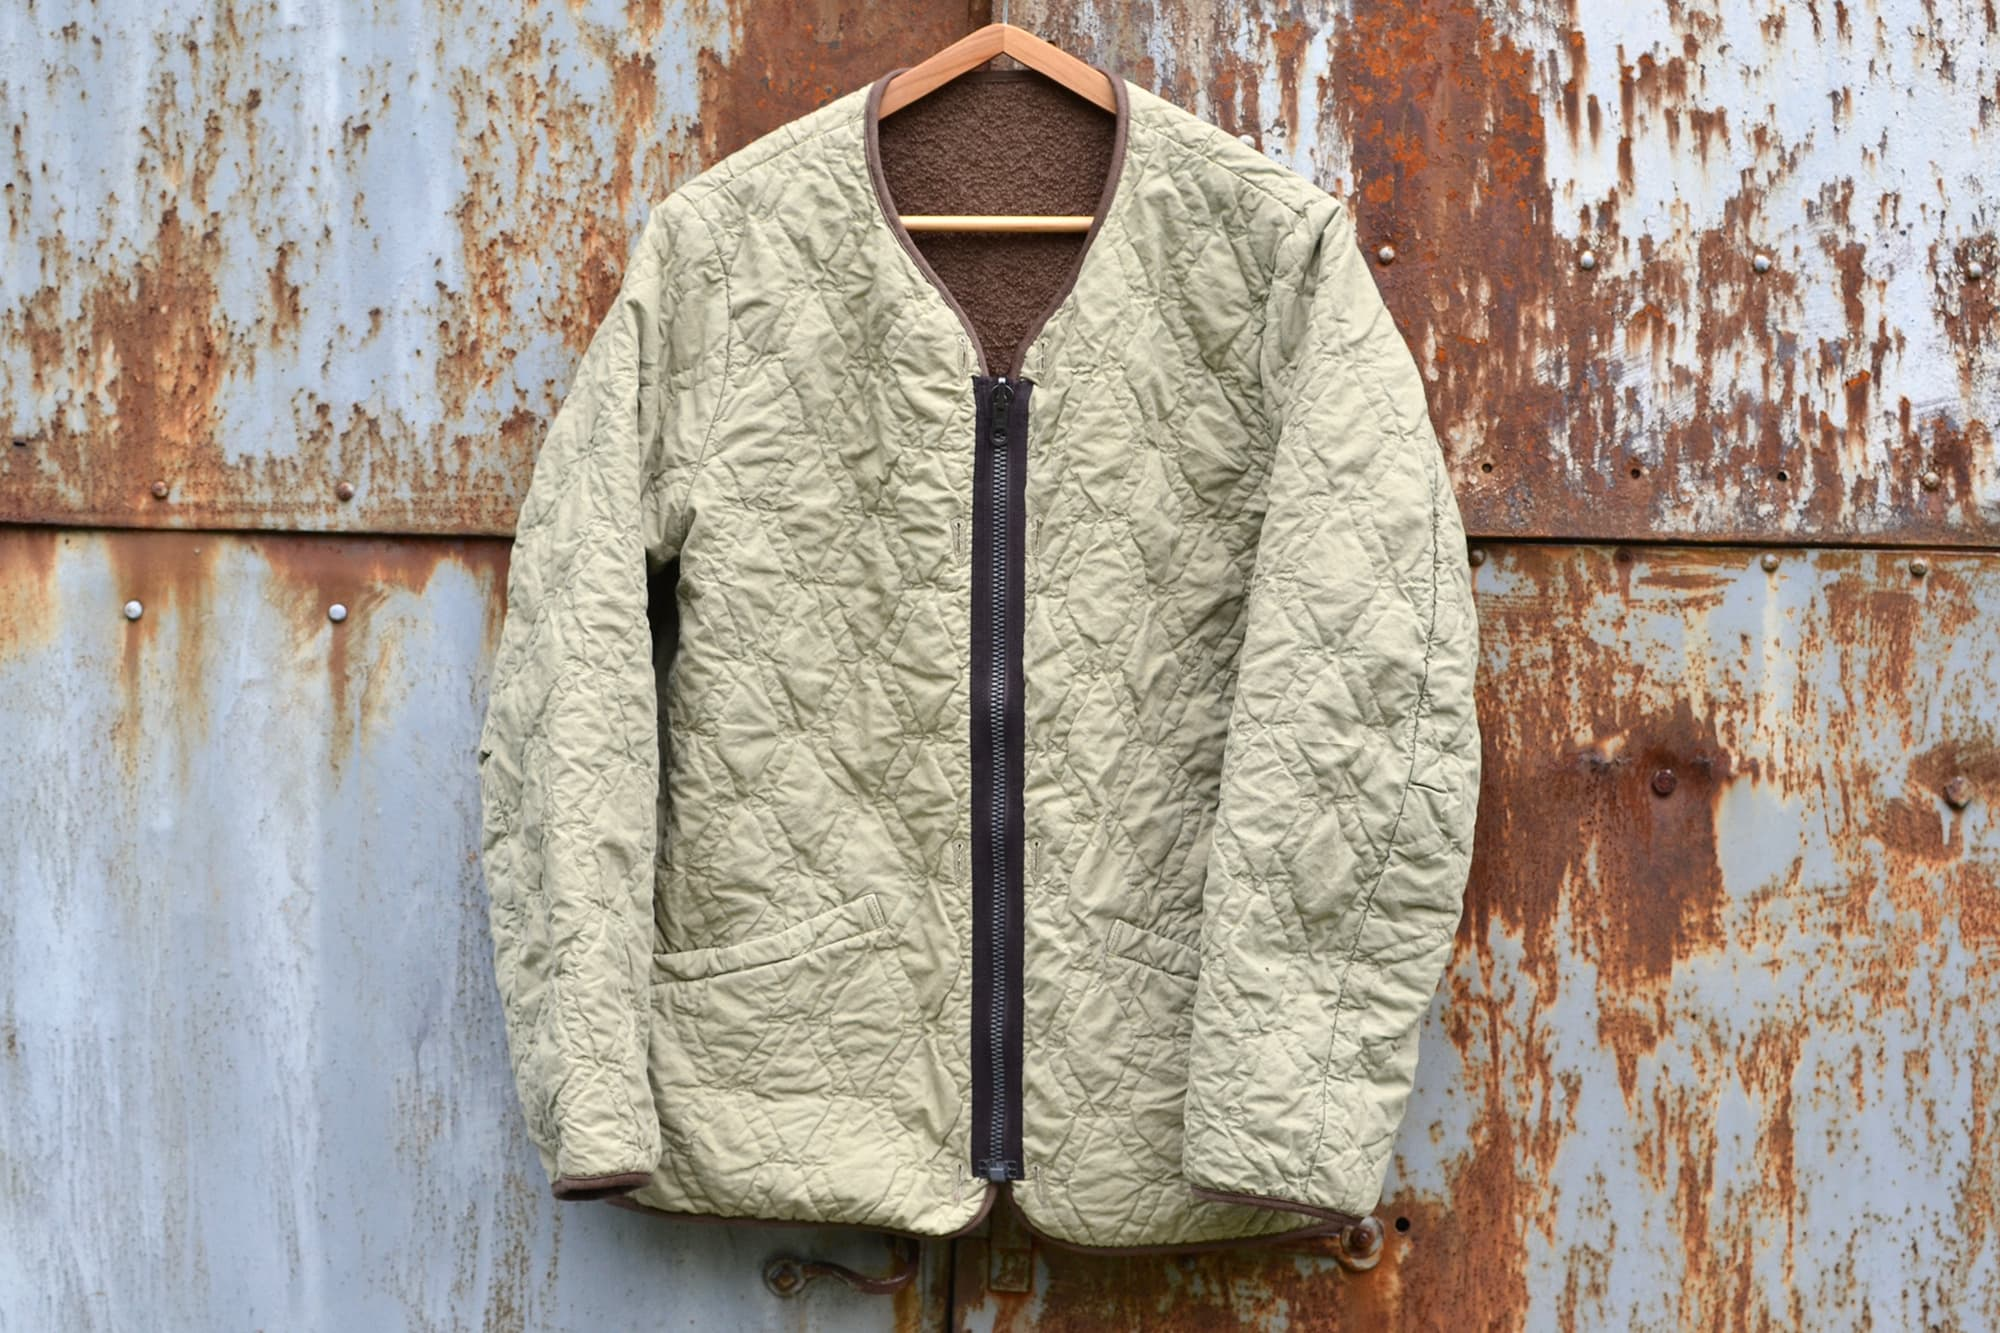 Visvim SS17 Iris Liner Jacket (Embroidery Lt Green)